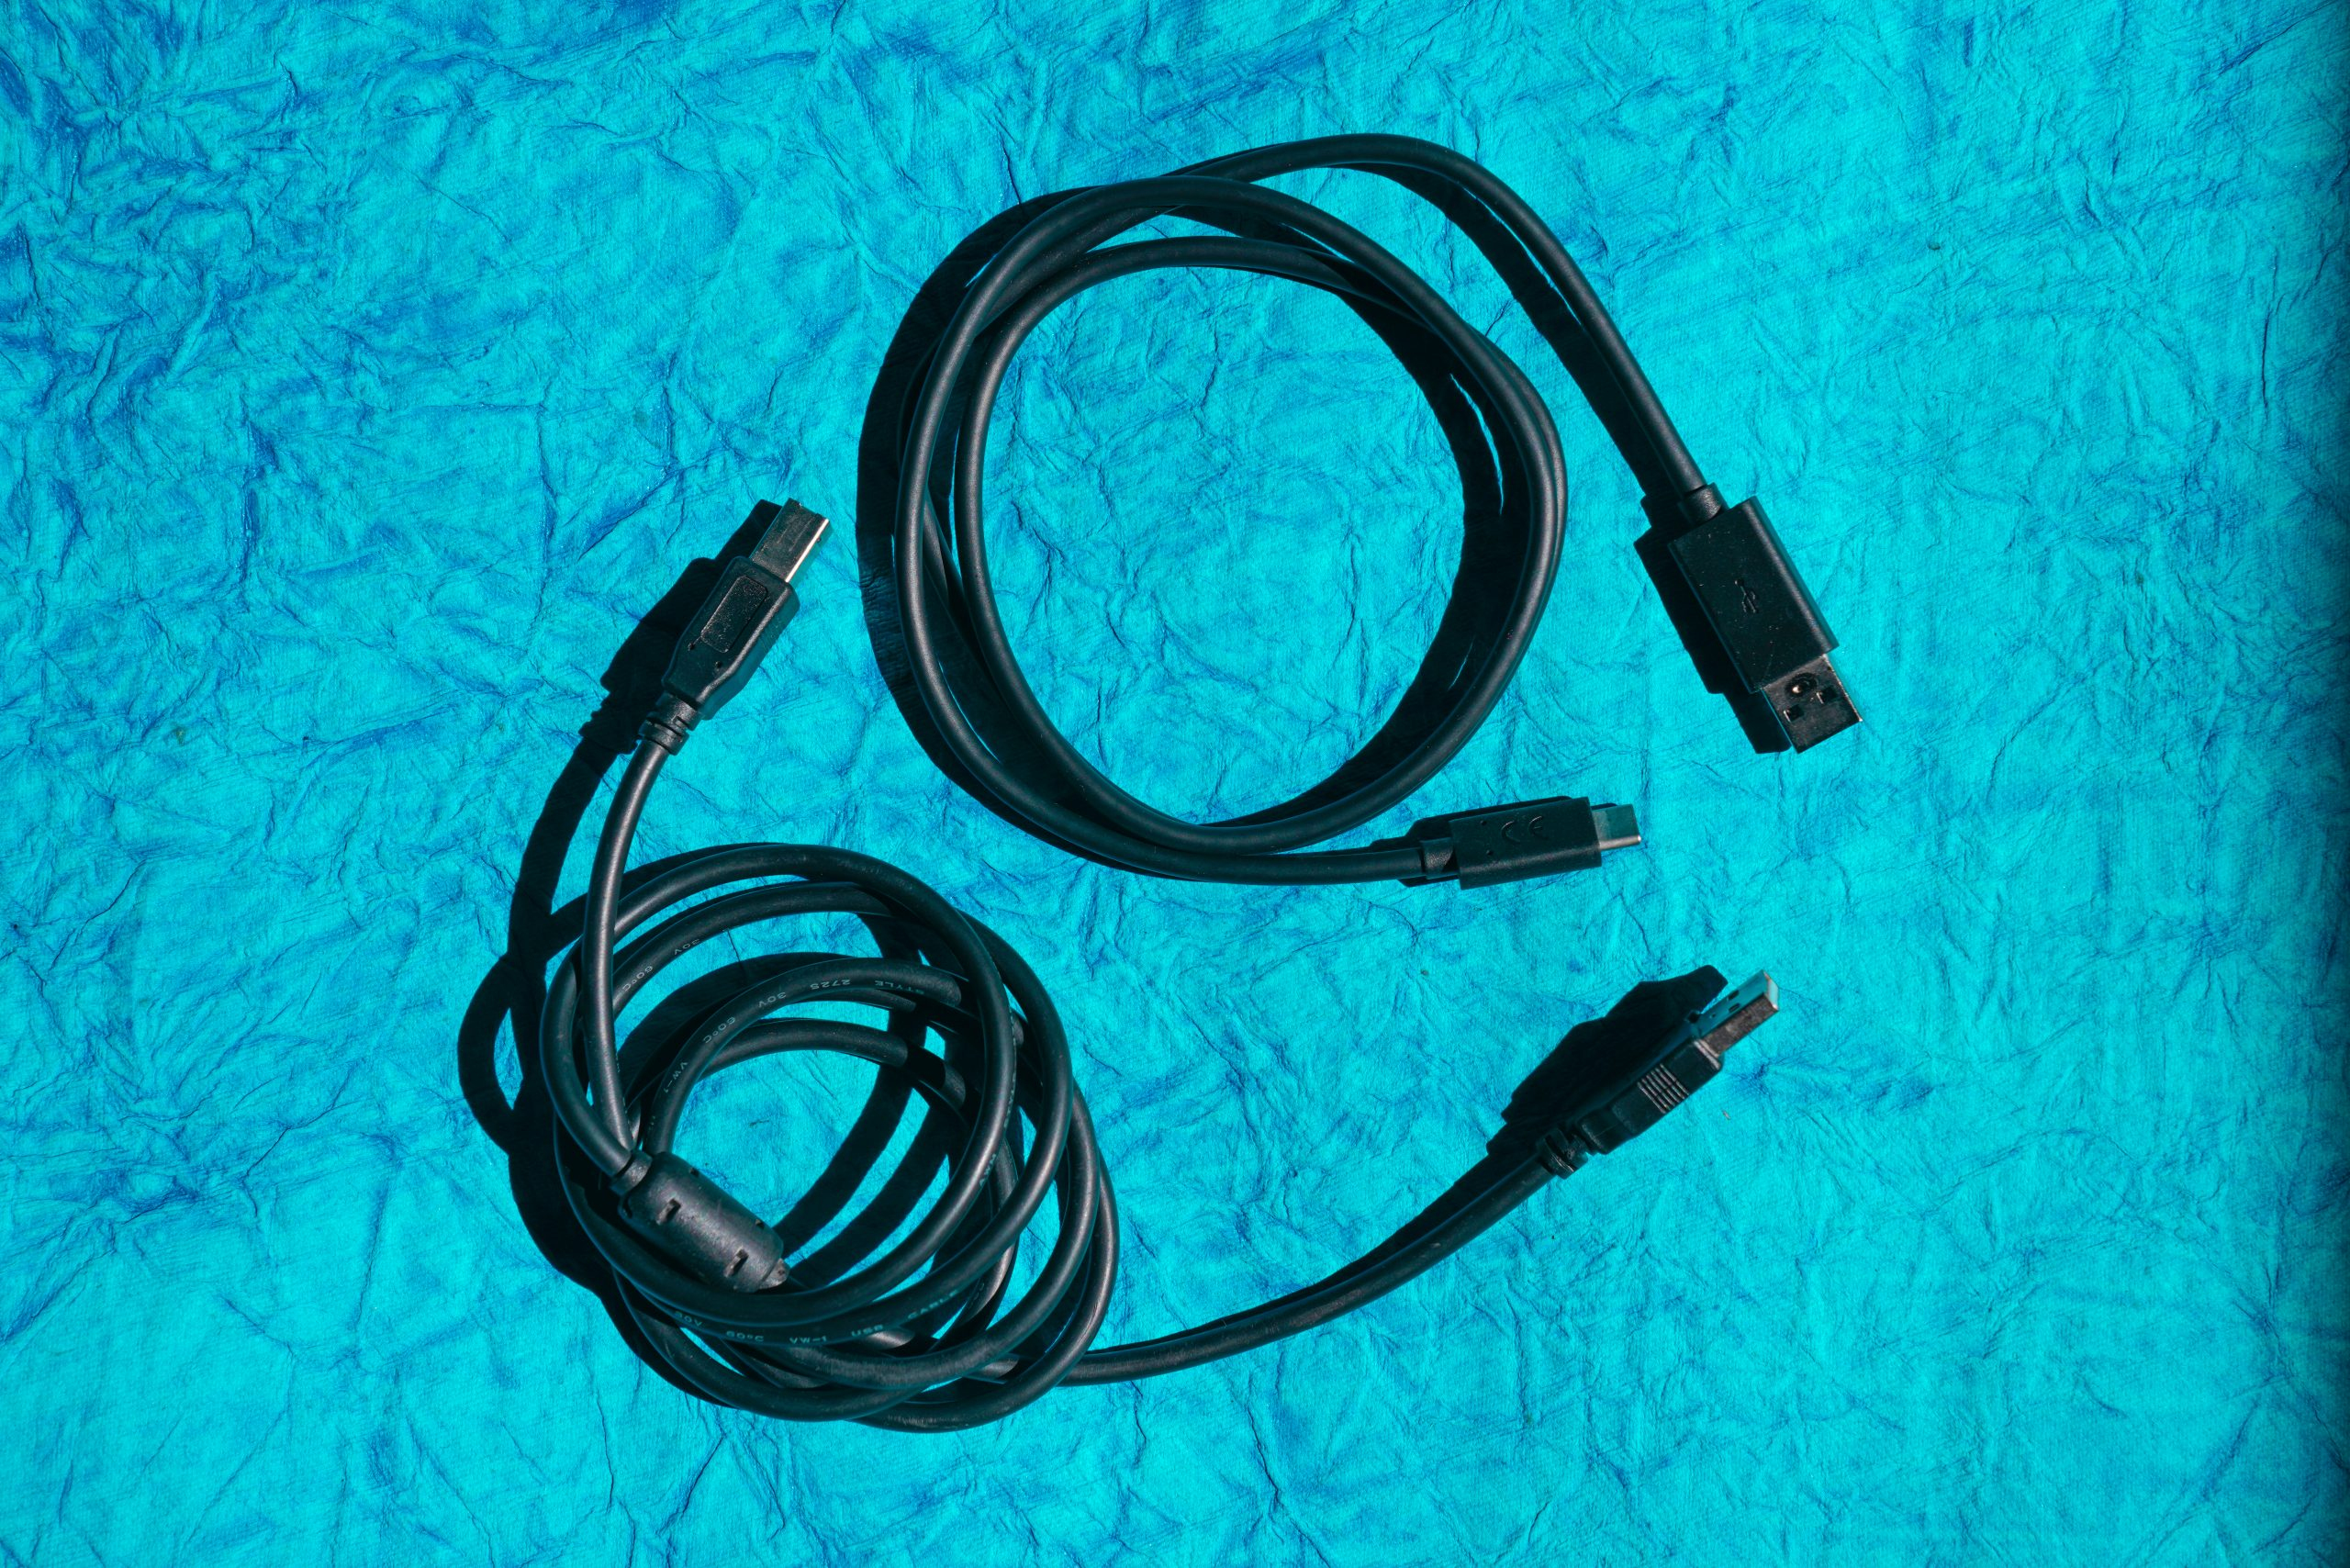 HDMI data cable